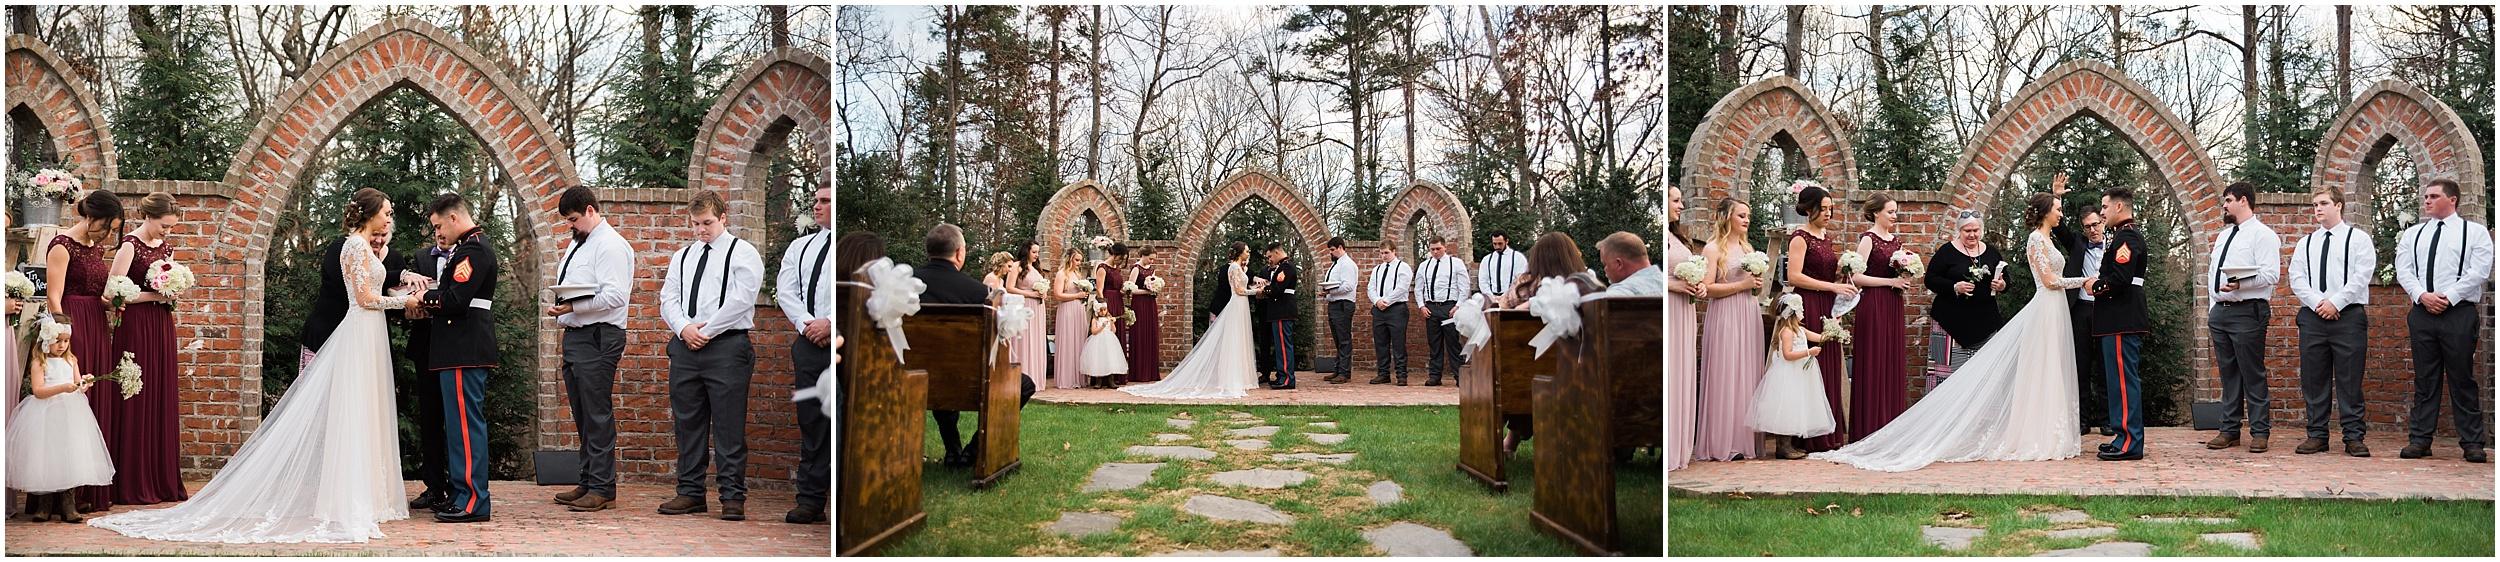 Ariel & Josh Southern Wedding in Monroe, North Carolina_0062.jpg